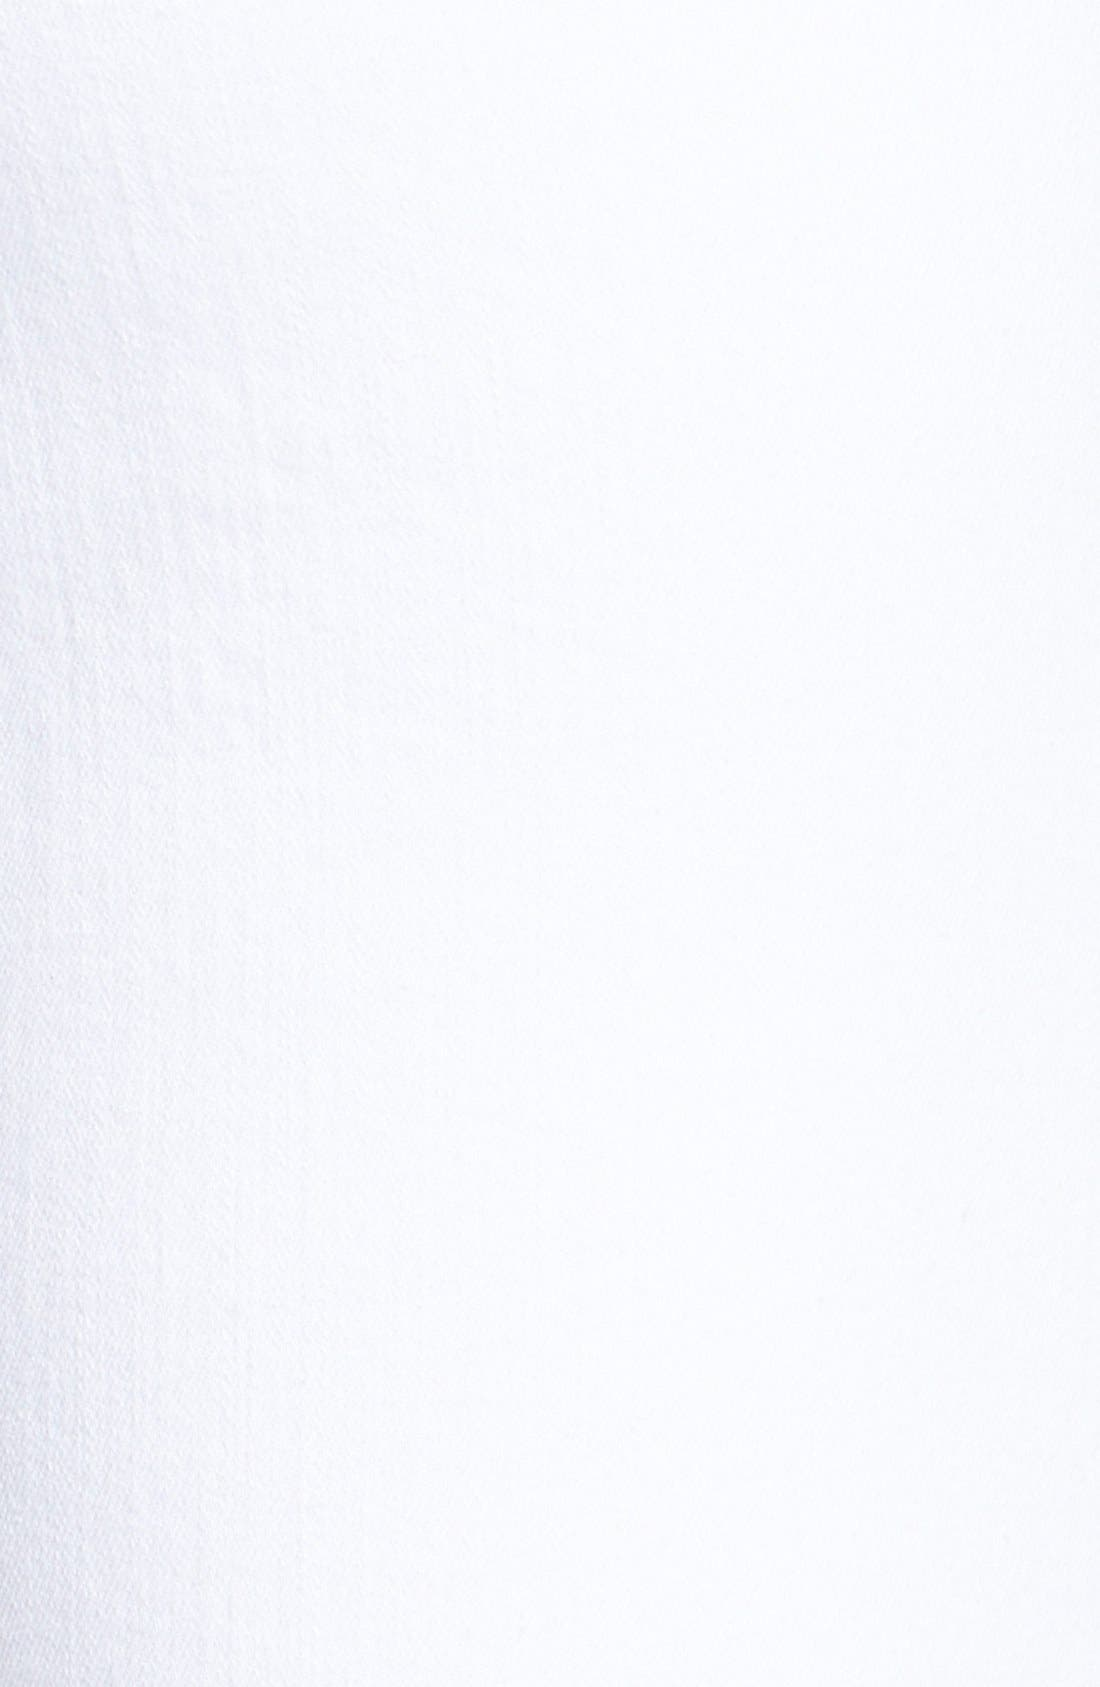 Stretch Crop Skinny Jeans,                             Alternate thumbnail 3, color,                             WHITE DENIM